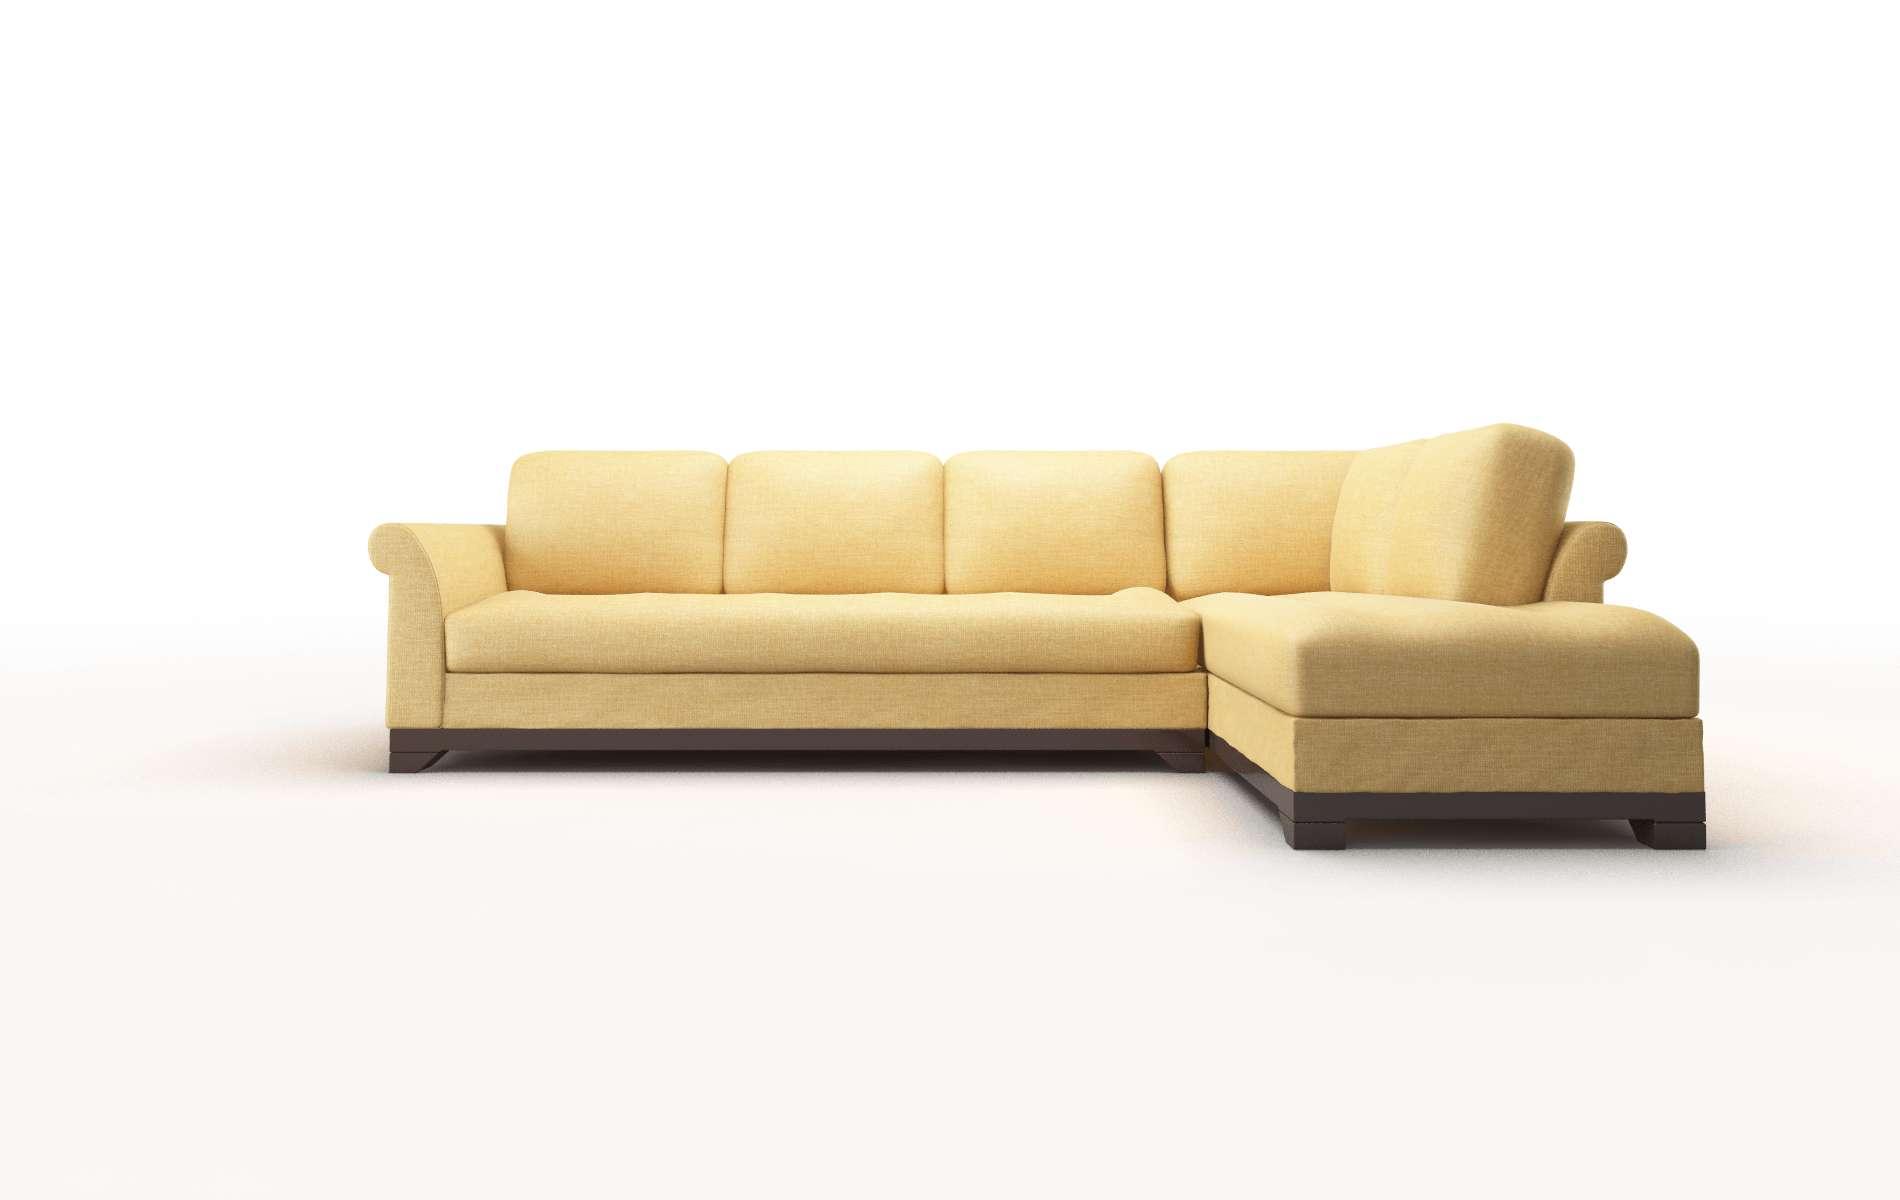 Denver Keylargo Honey chair espresso legs